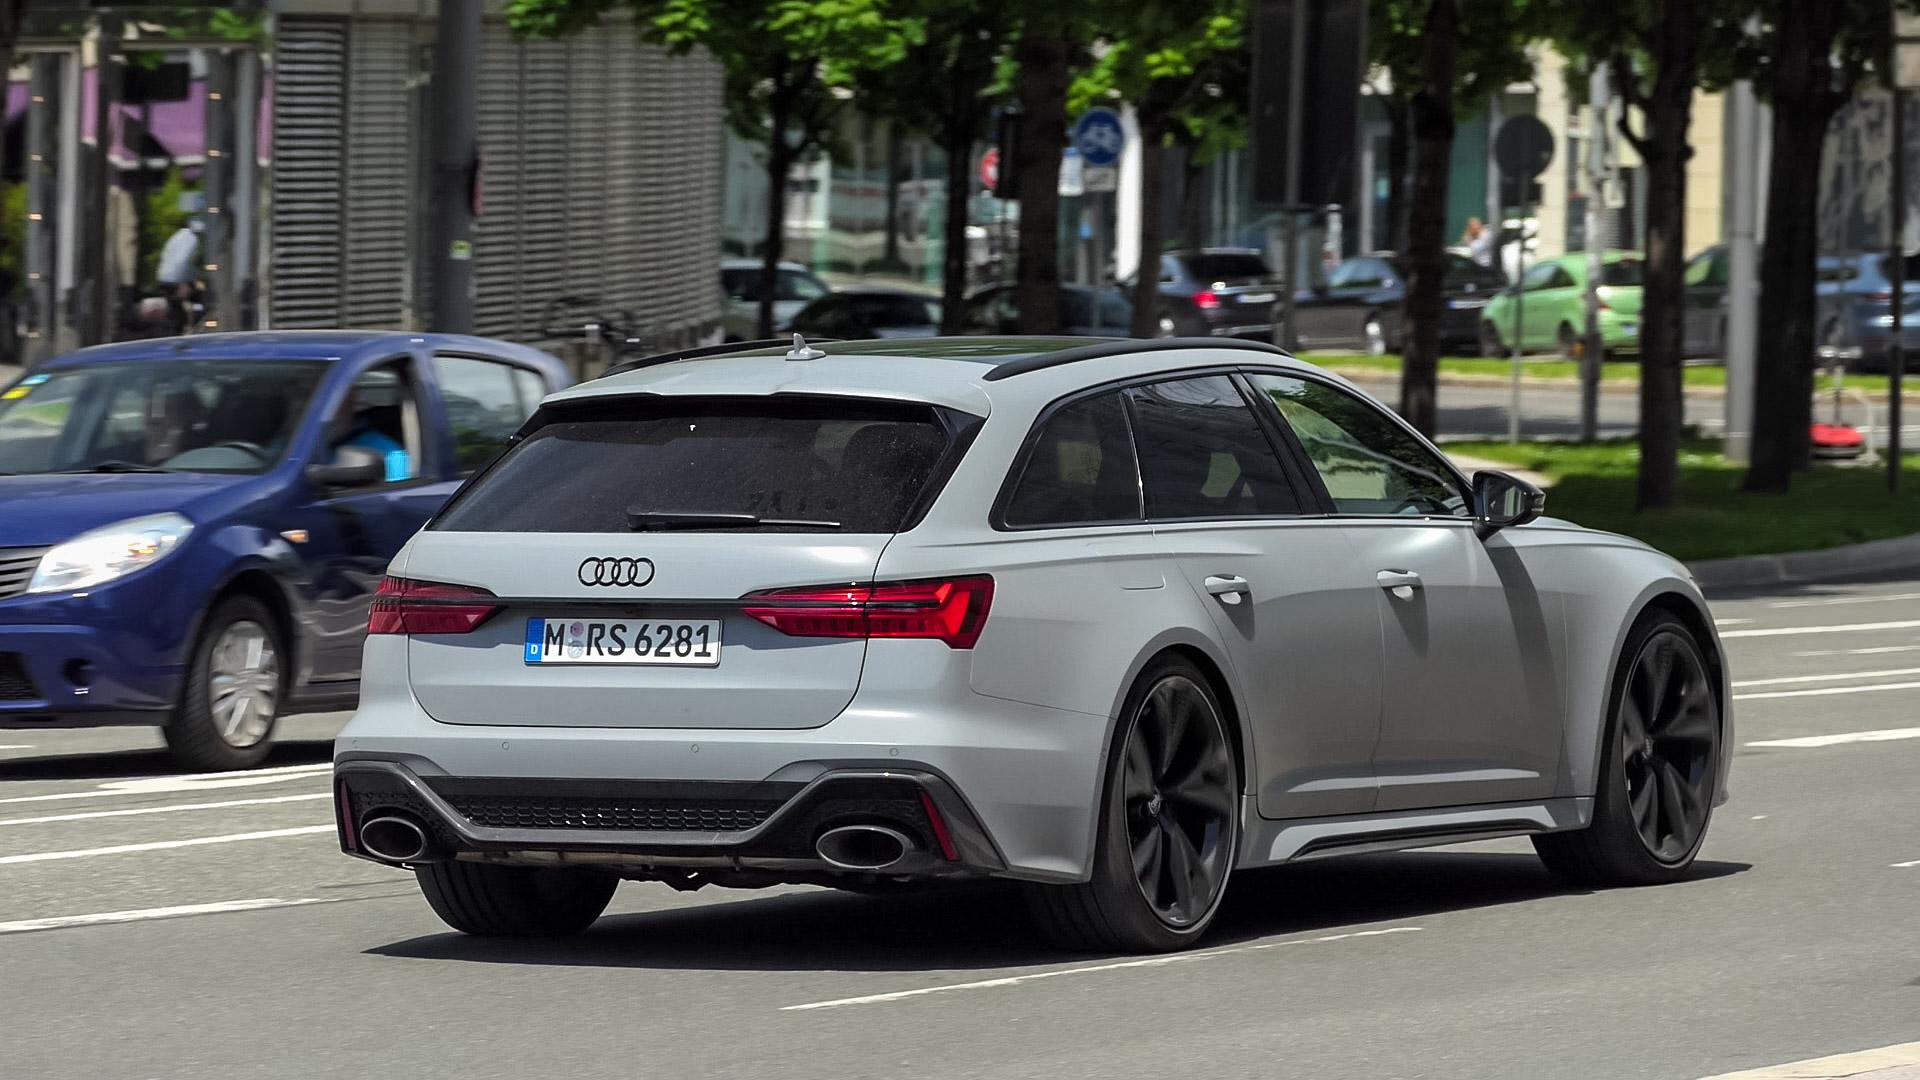 Audi RS6 - M-RS-6281